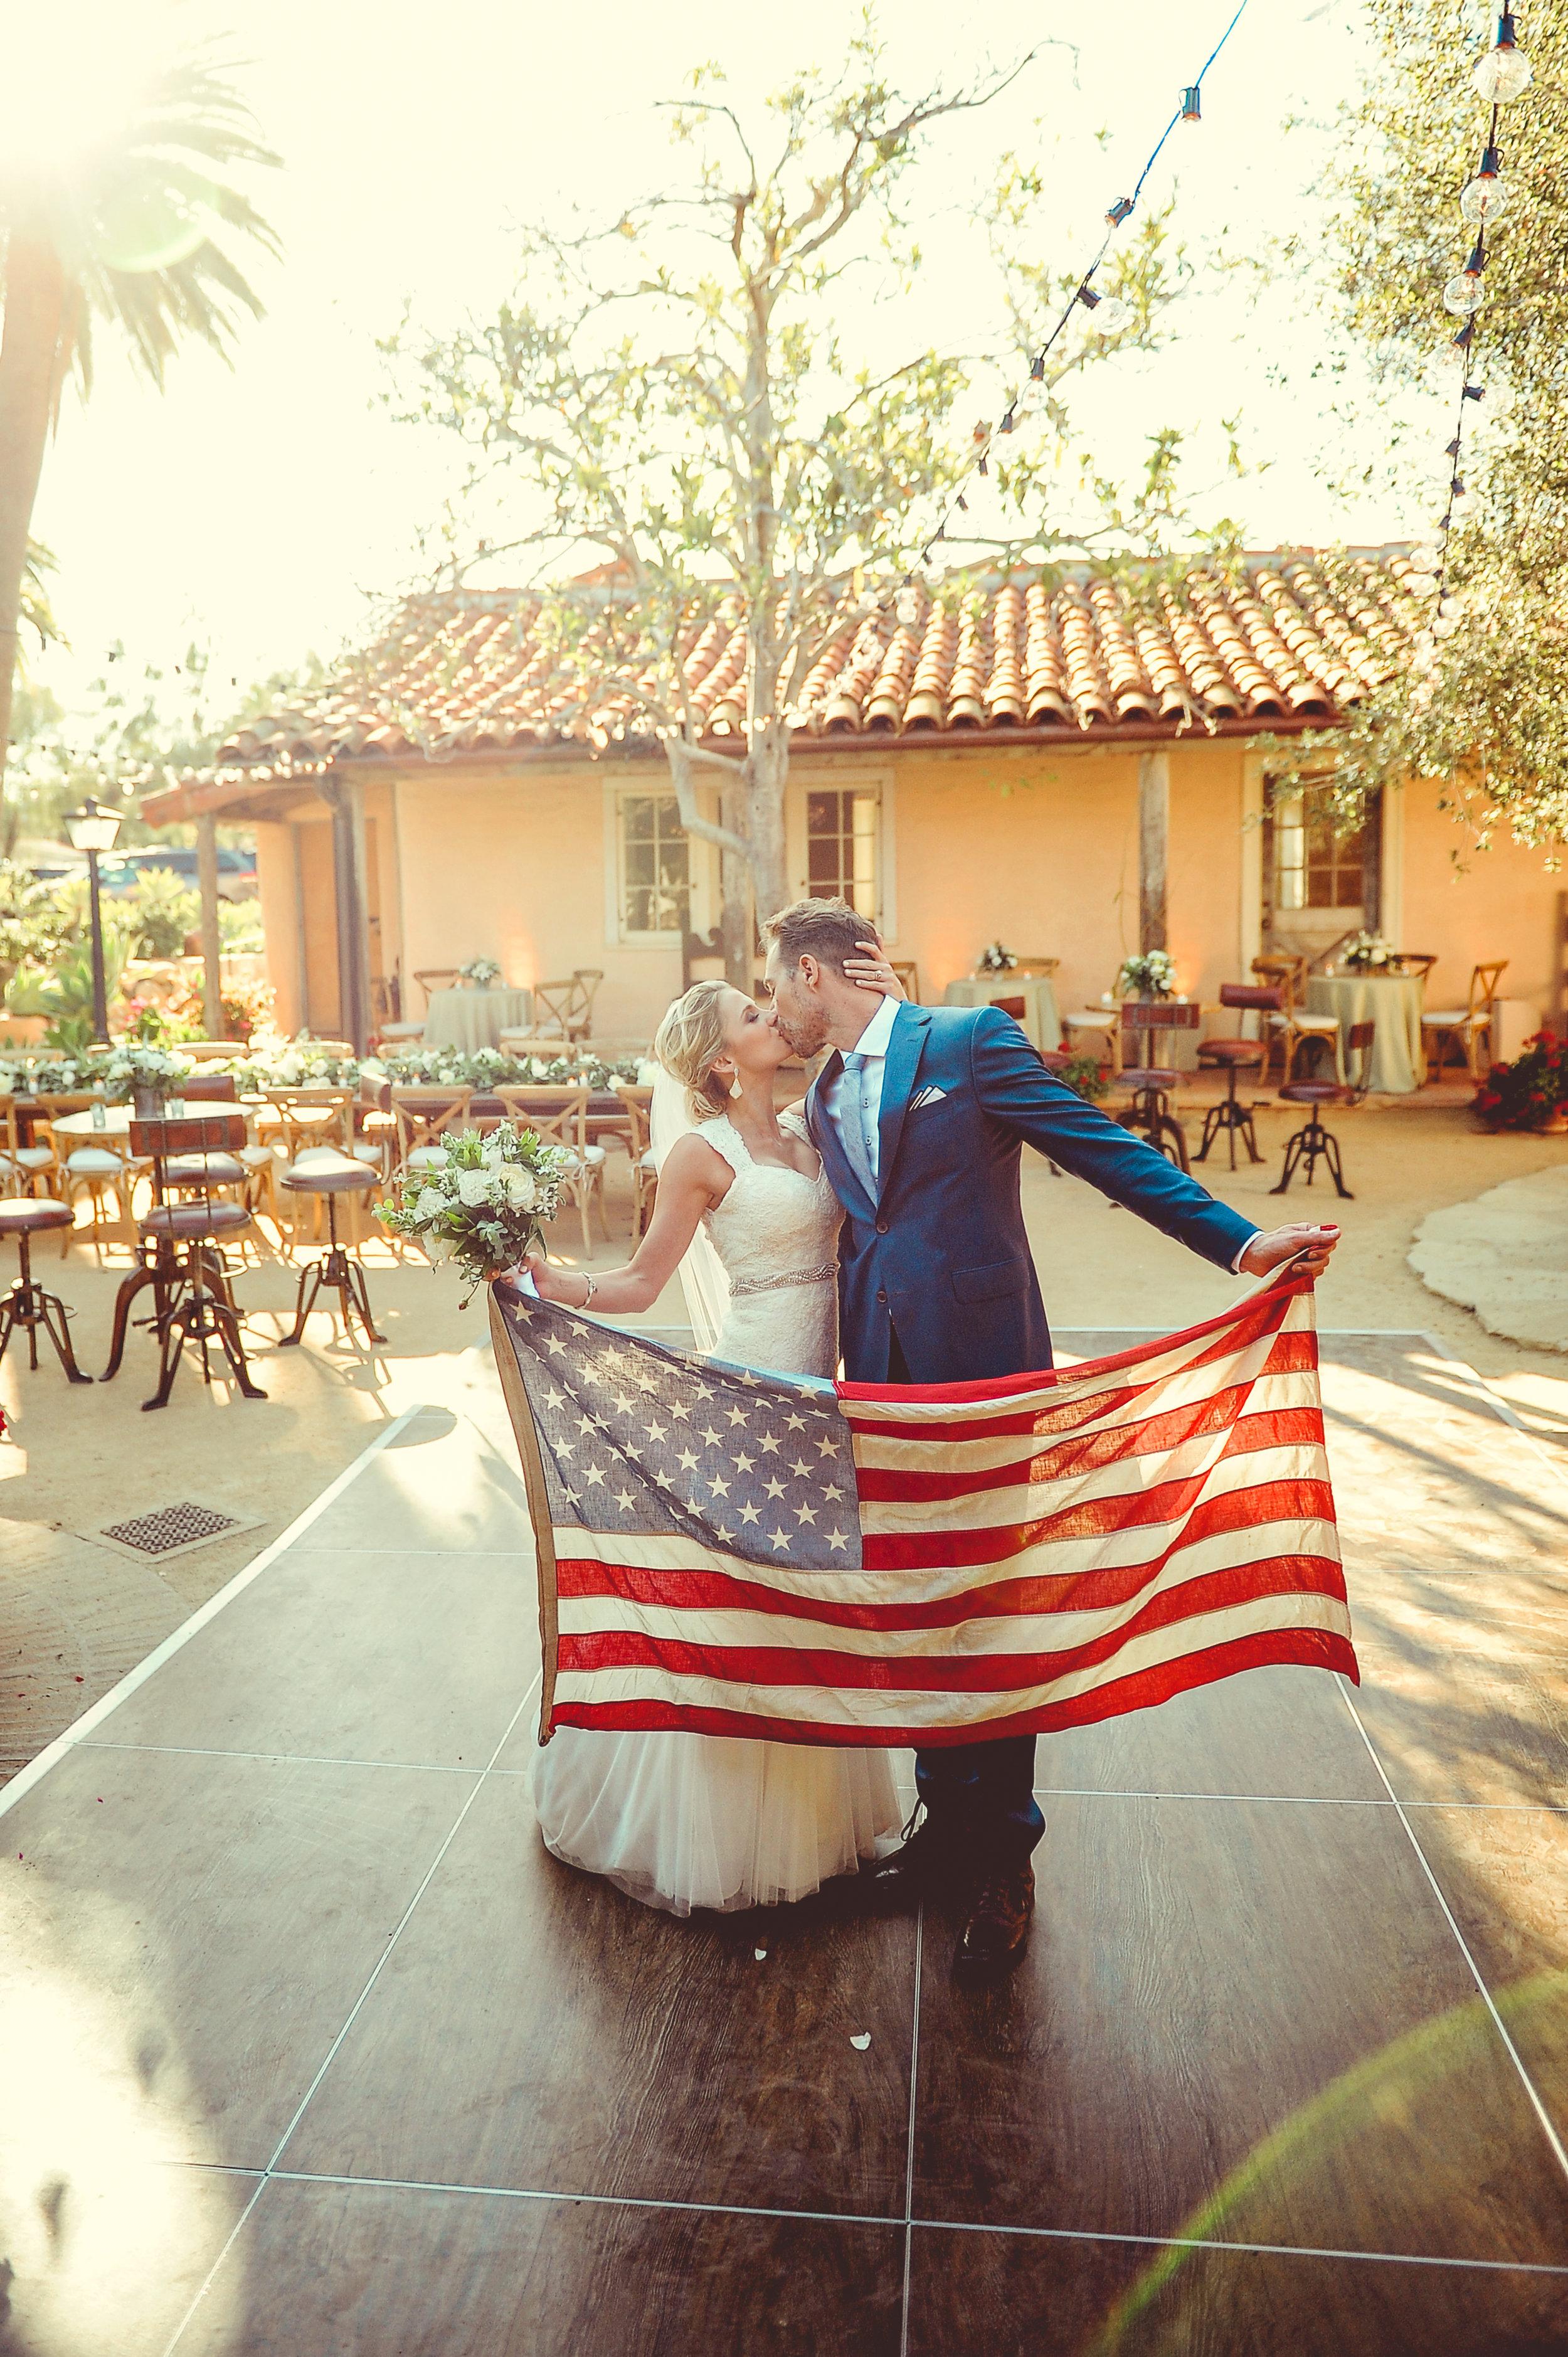 www.santabarbarawedding.com   JKoe Photography   La Fete Weddings   Santa Barbara Historical Museum   Bride and Groom